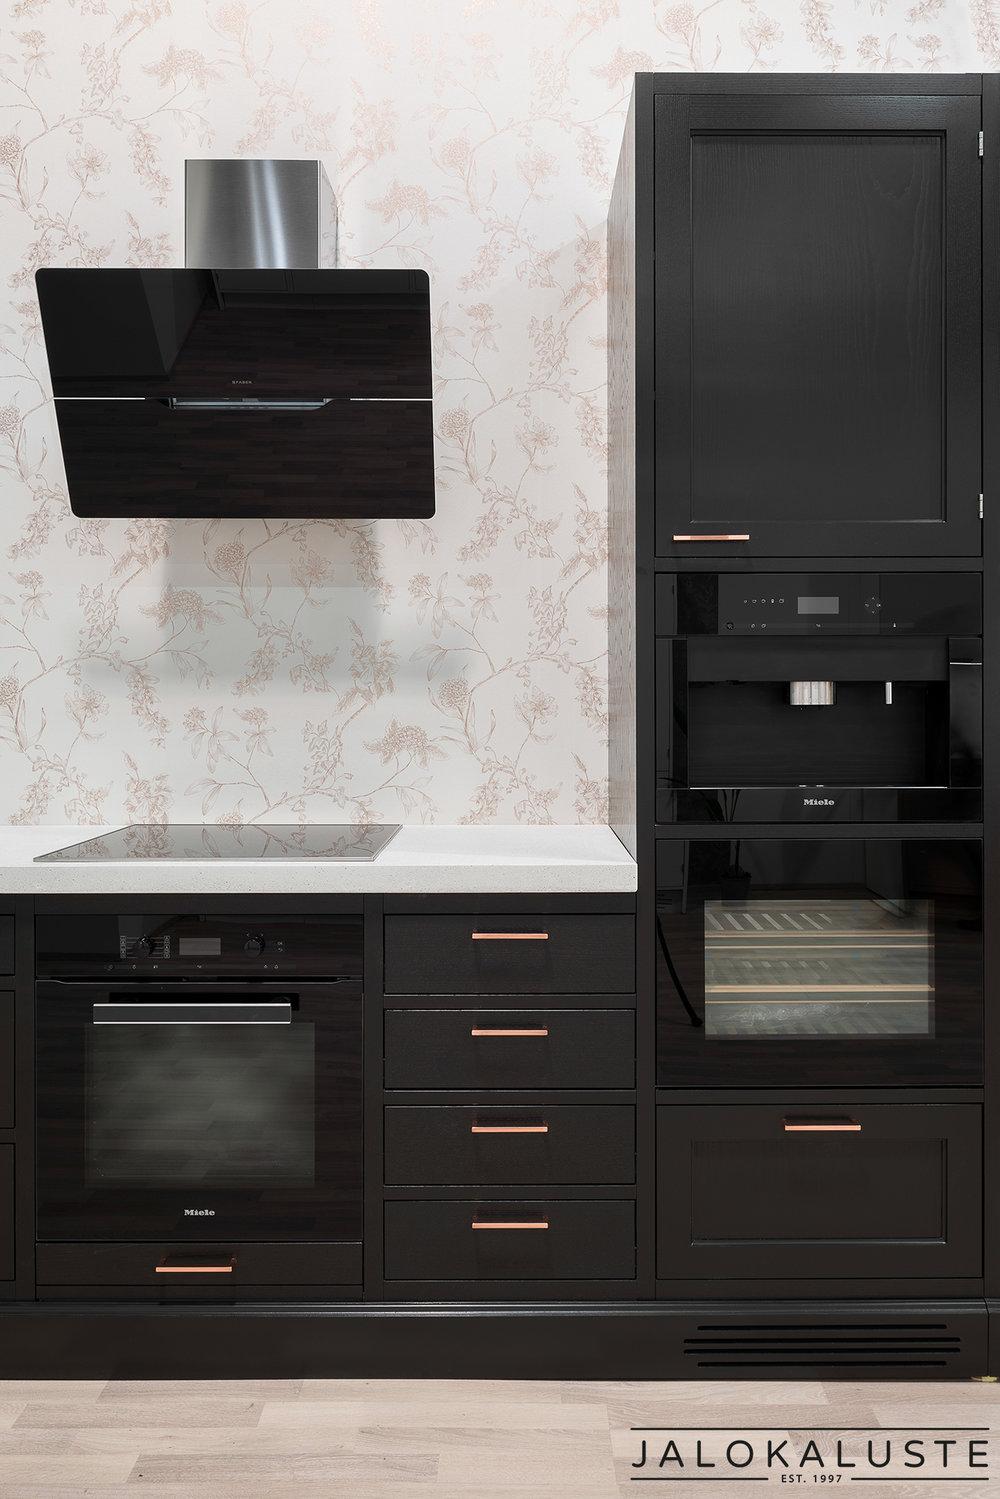 Jalokaluste_musta-kupari-keittiö3.jpg